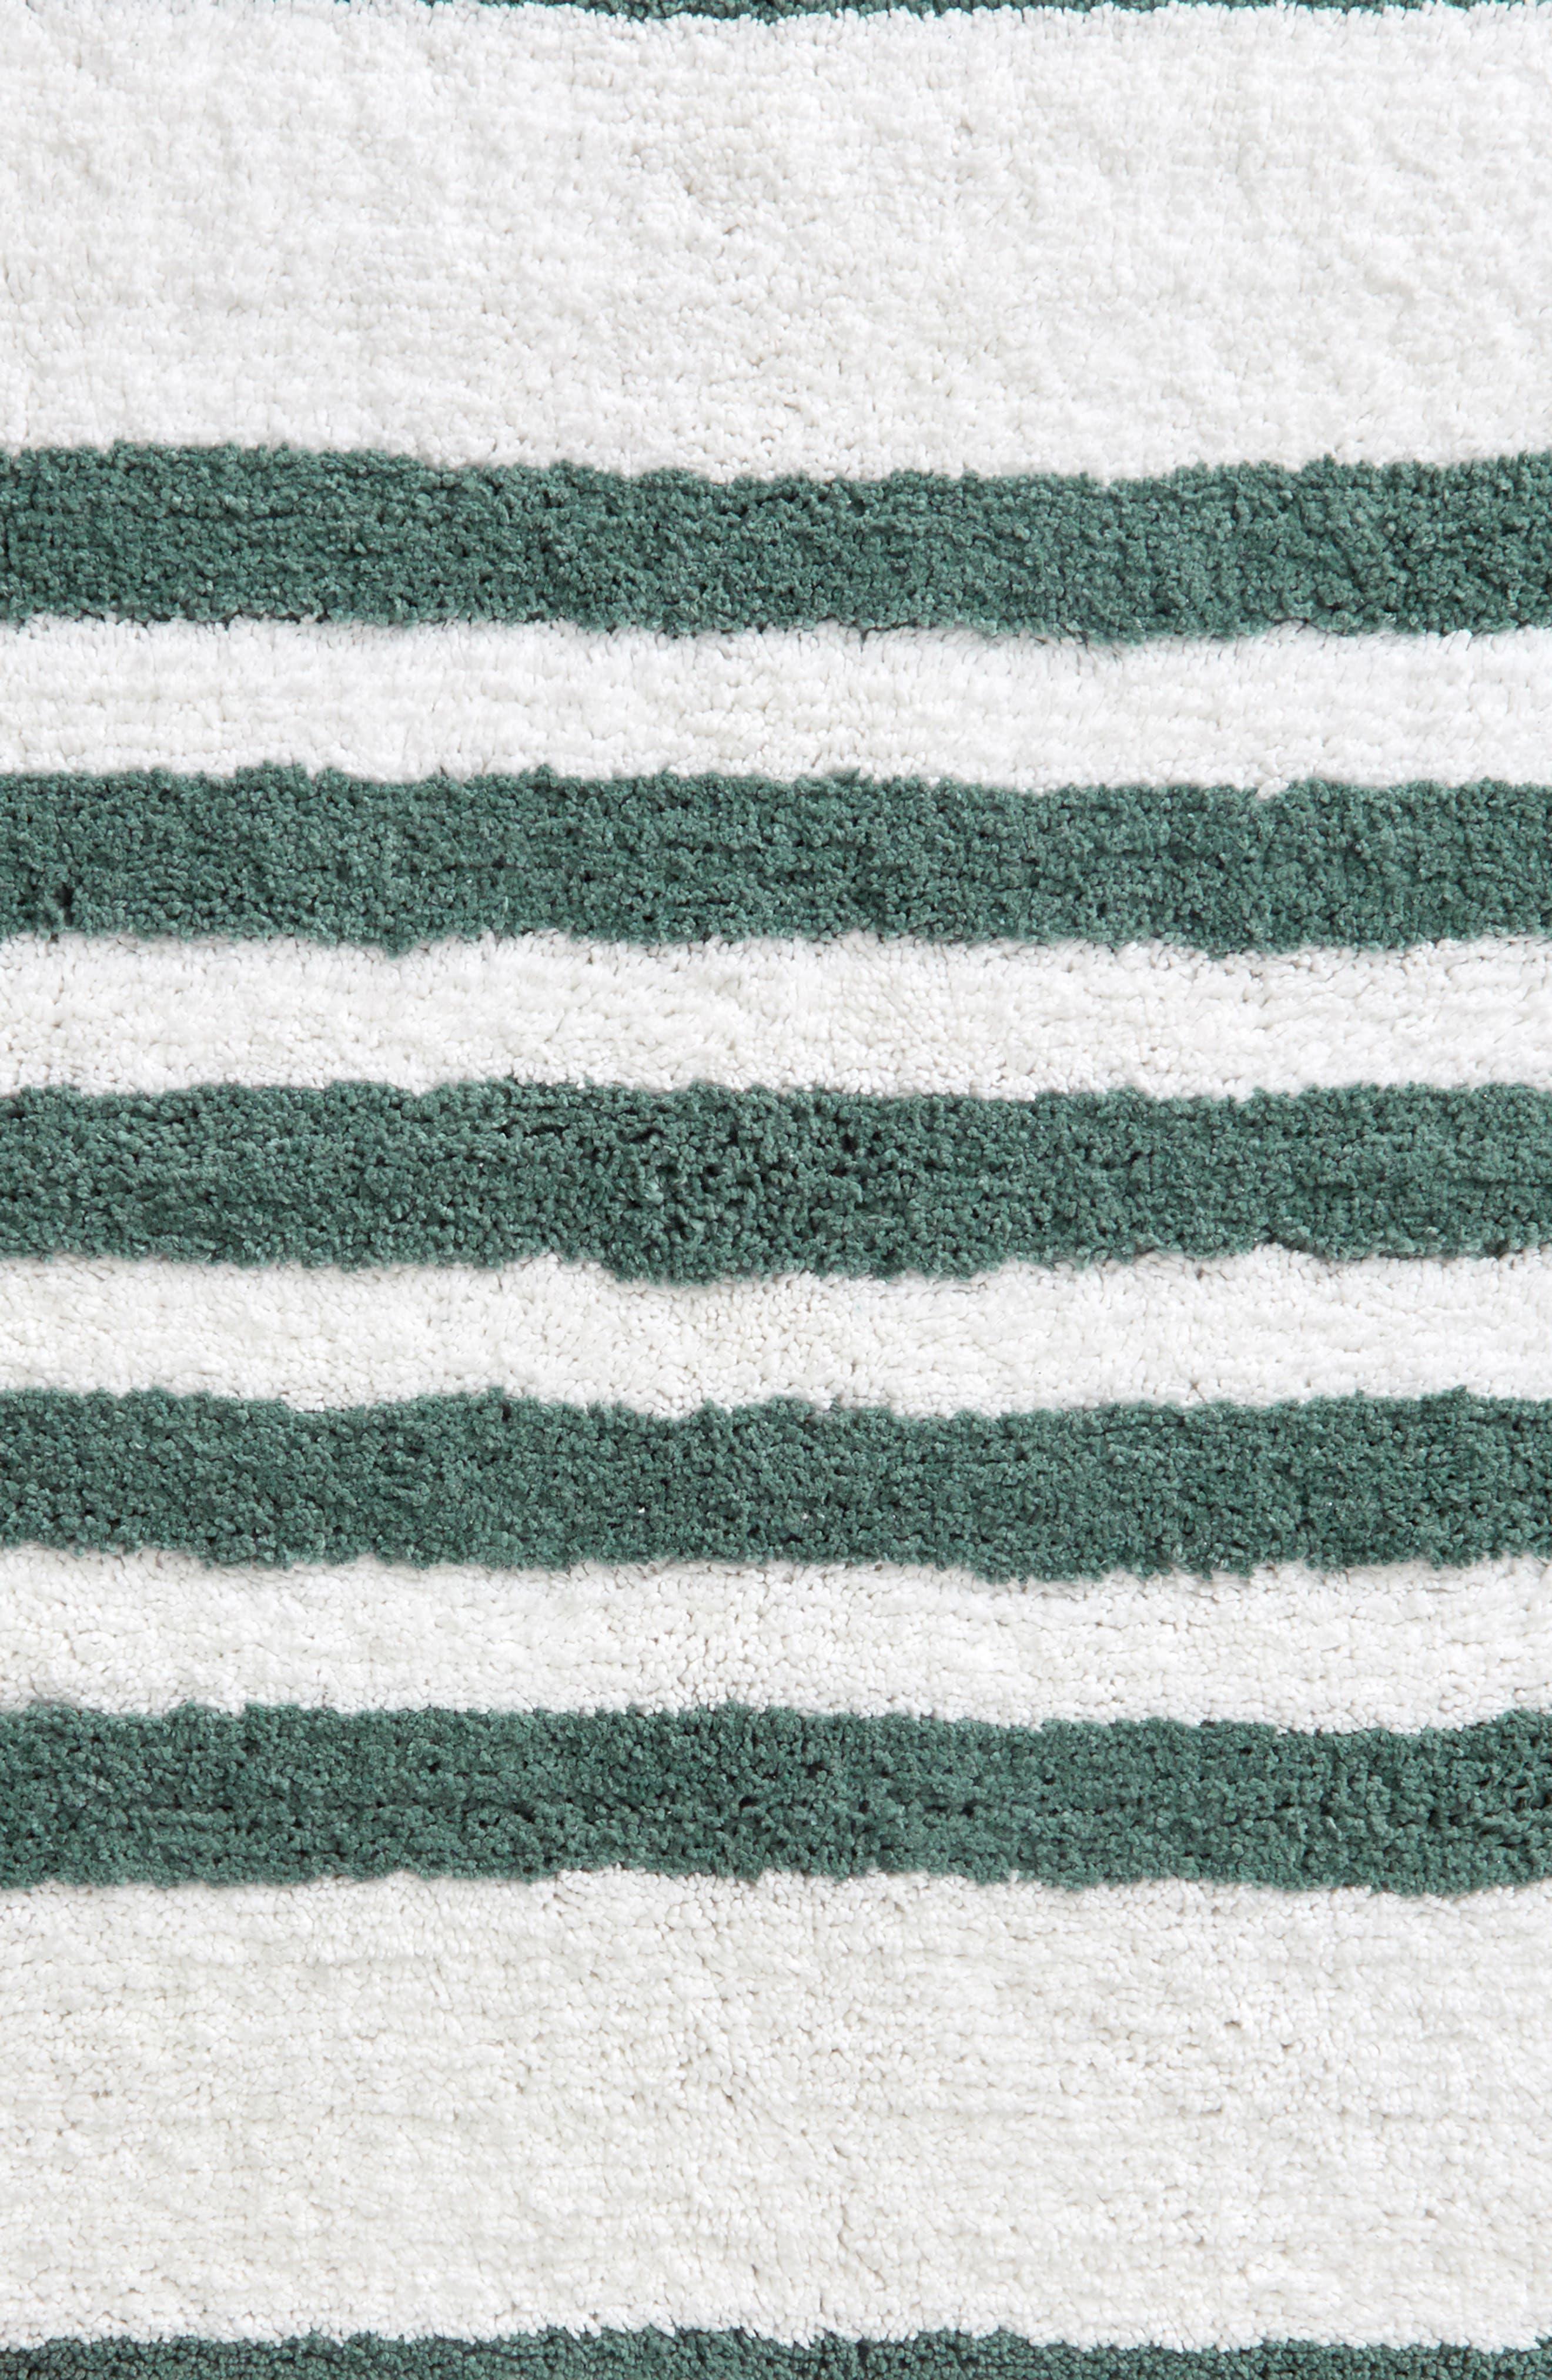 NORDSTROM AT HOME,                             Stripe Bath Rug,                             Alternate thumbnail 2, color,                             TEAL TITANIC